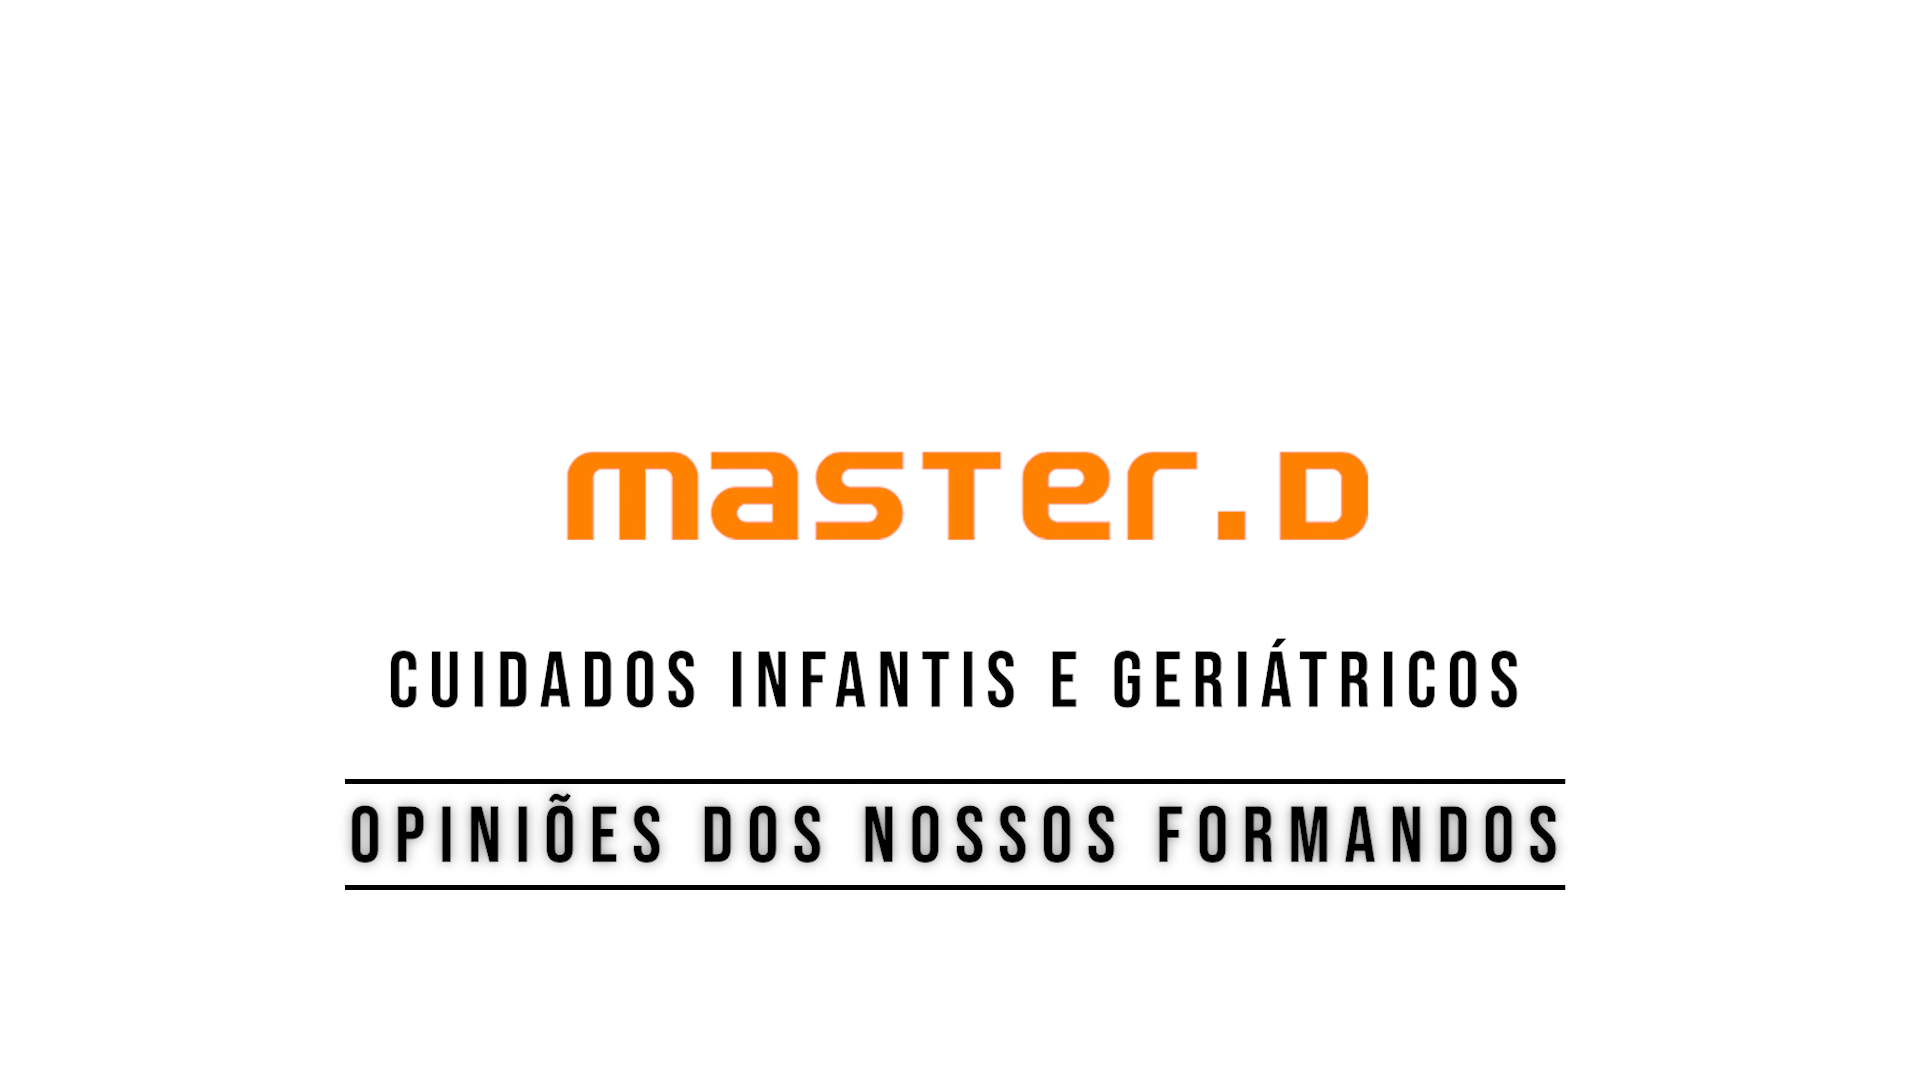 opinioes positivas - Cursos Master D